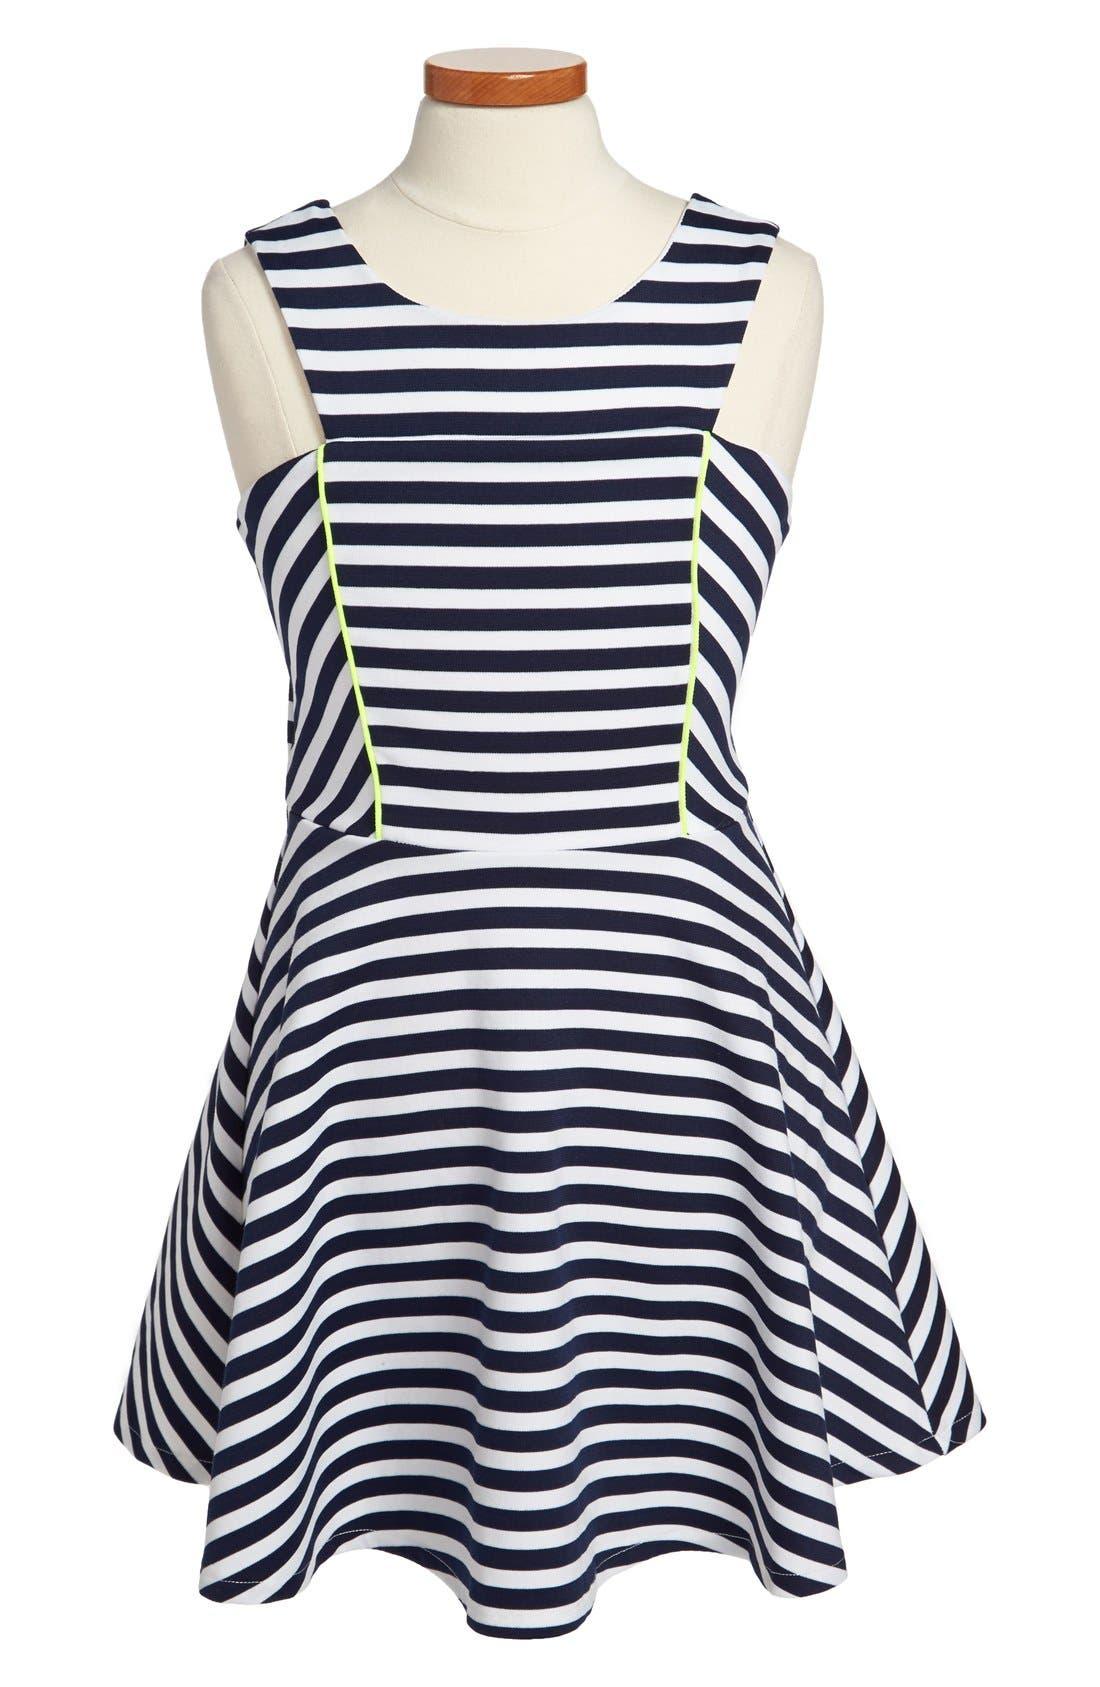 Alternate Image 1 Selected - Sally Miller 'The West Palm' Stripe Dress (Big Girls)